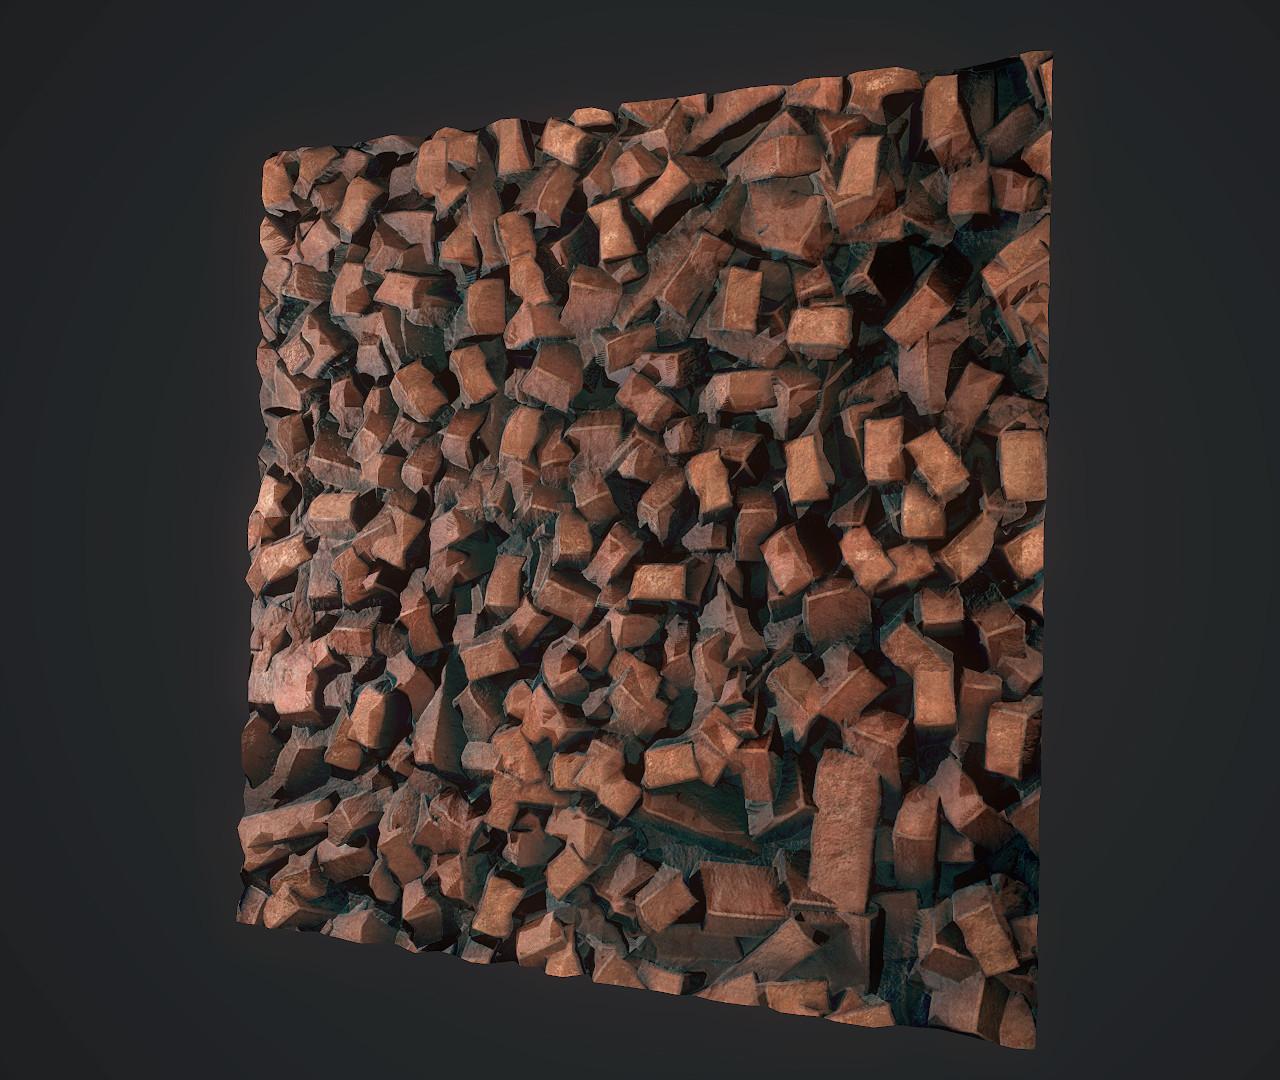 Pawel margacz rubble